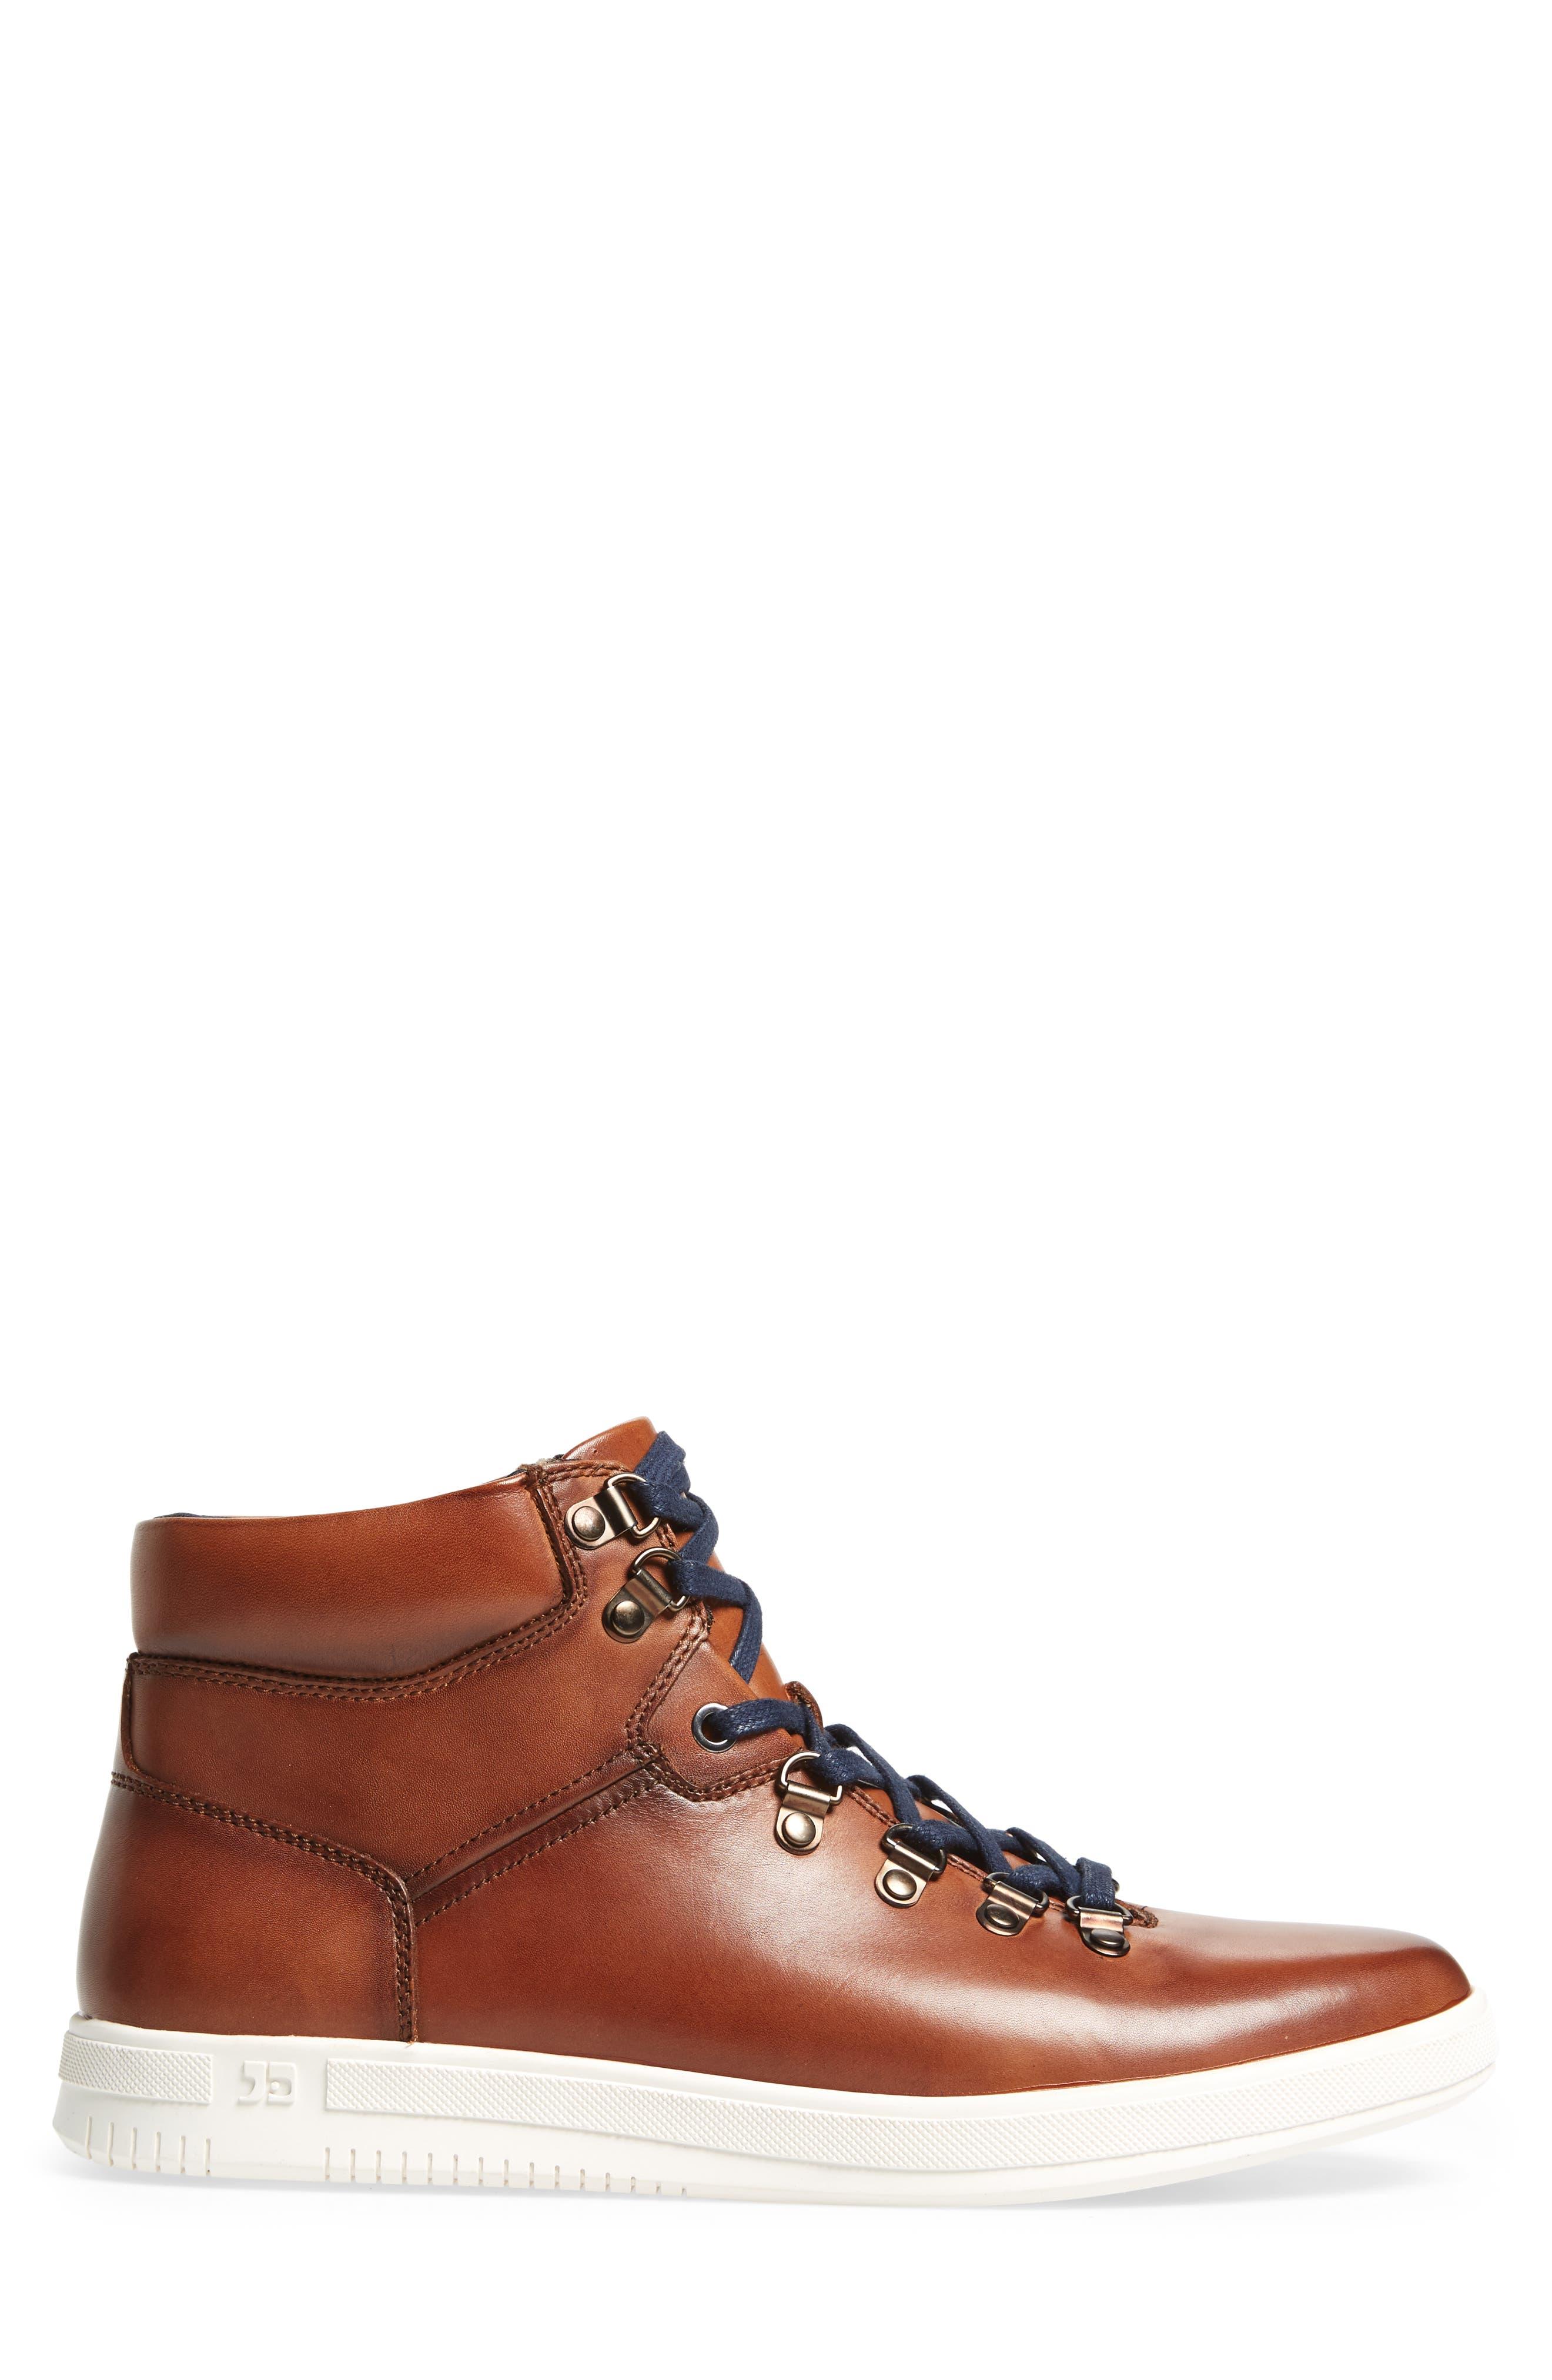 Slow Joe Mid Top Sneaker,                             Alternate thumbnail 3, color,                             Tan Leather